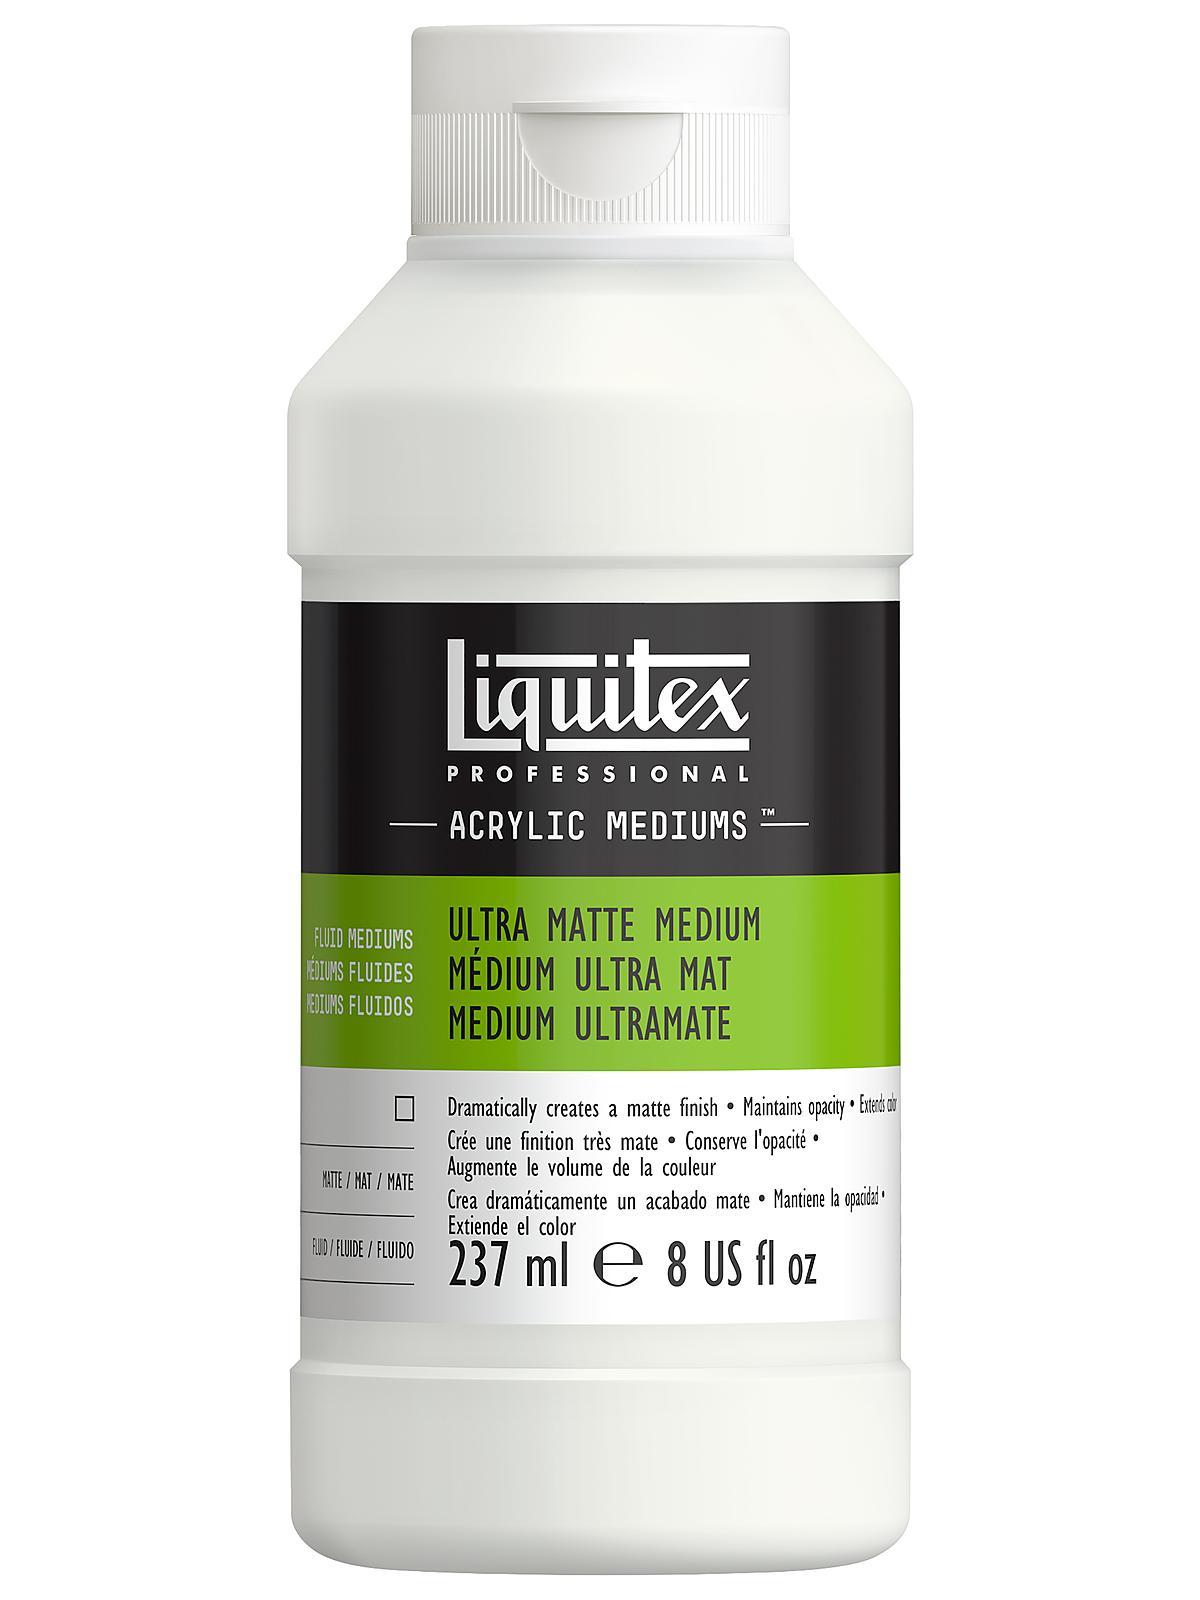 Liquitex ultra matte medium for Gloss medium for acrylic painting